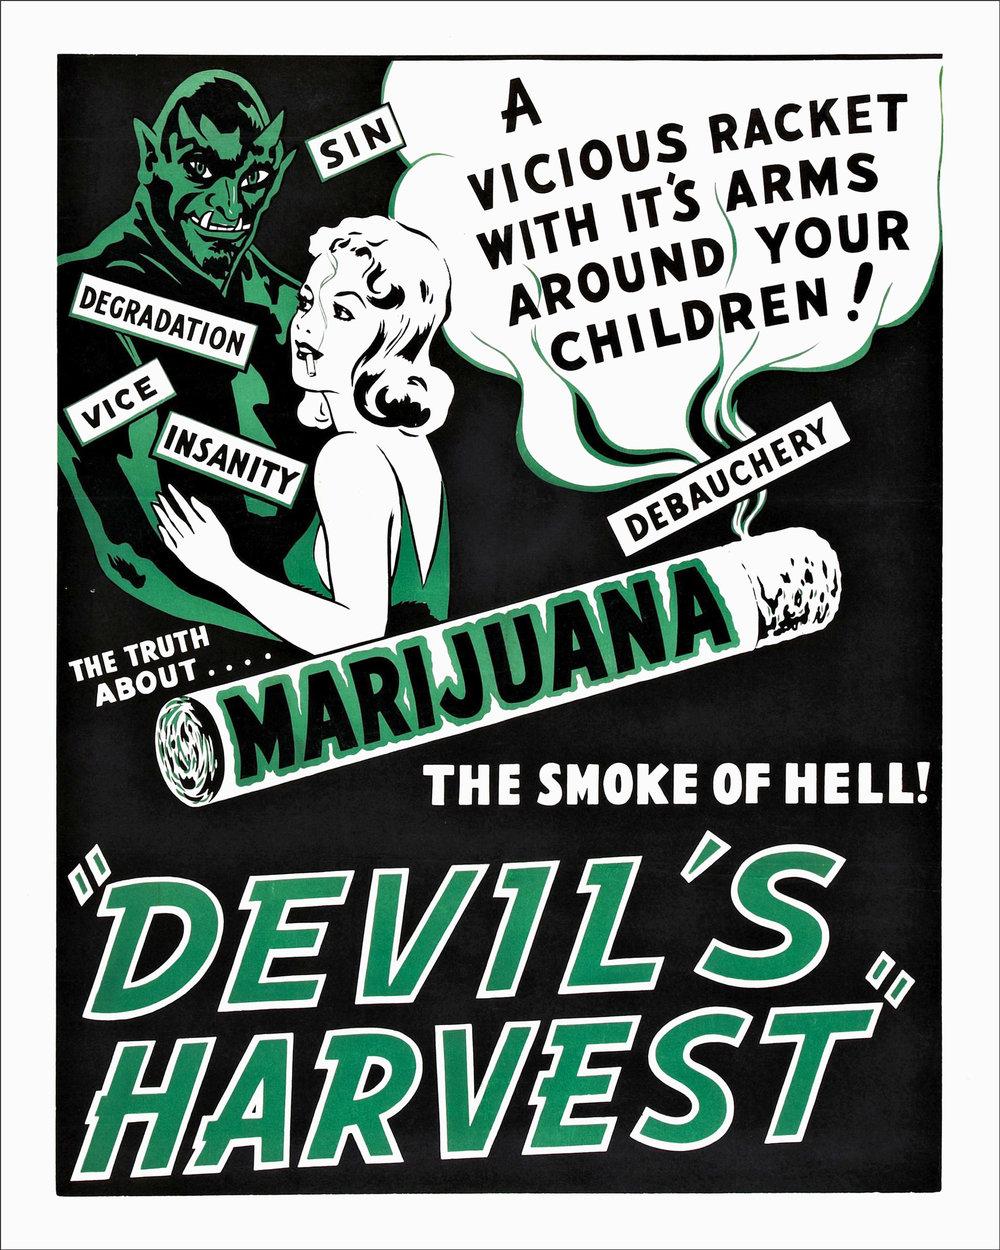 pm8_sd_dru_devils-harvest-marijuana-poster_F.jpg